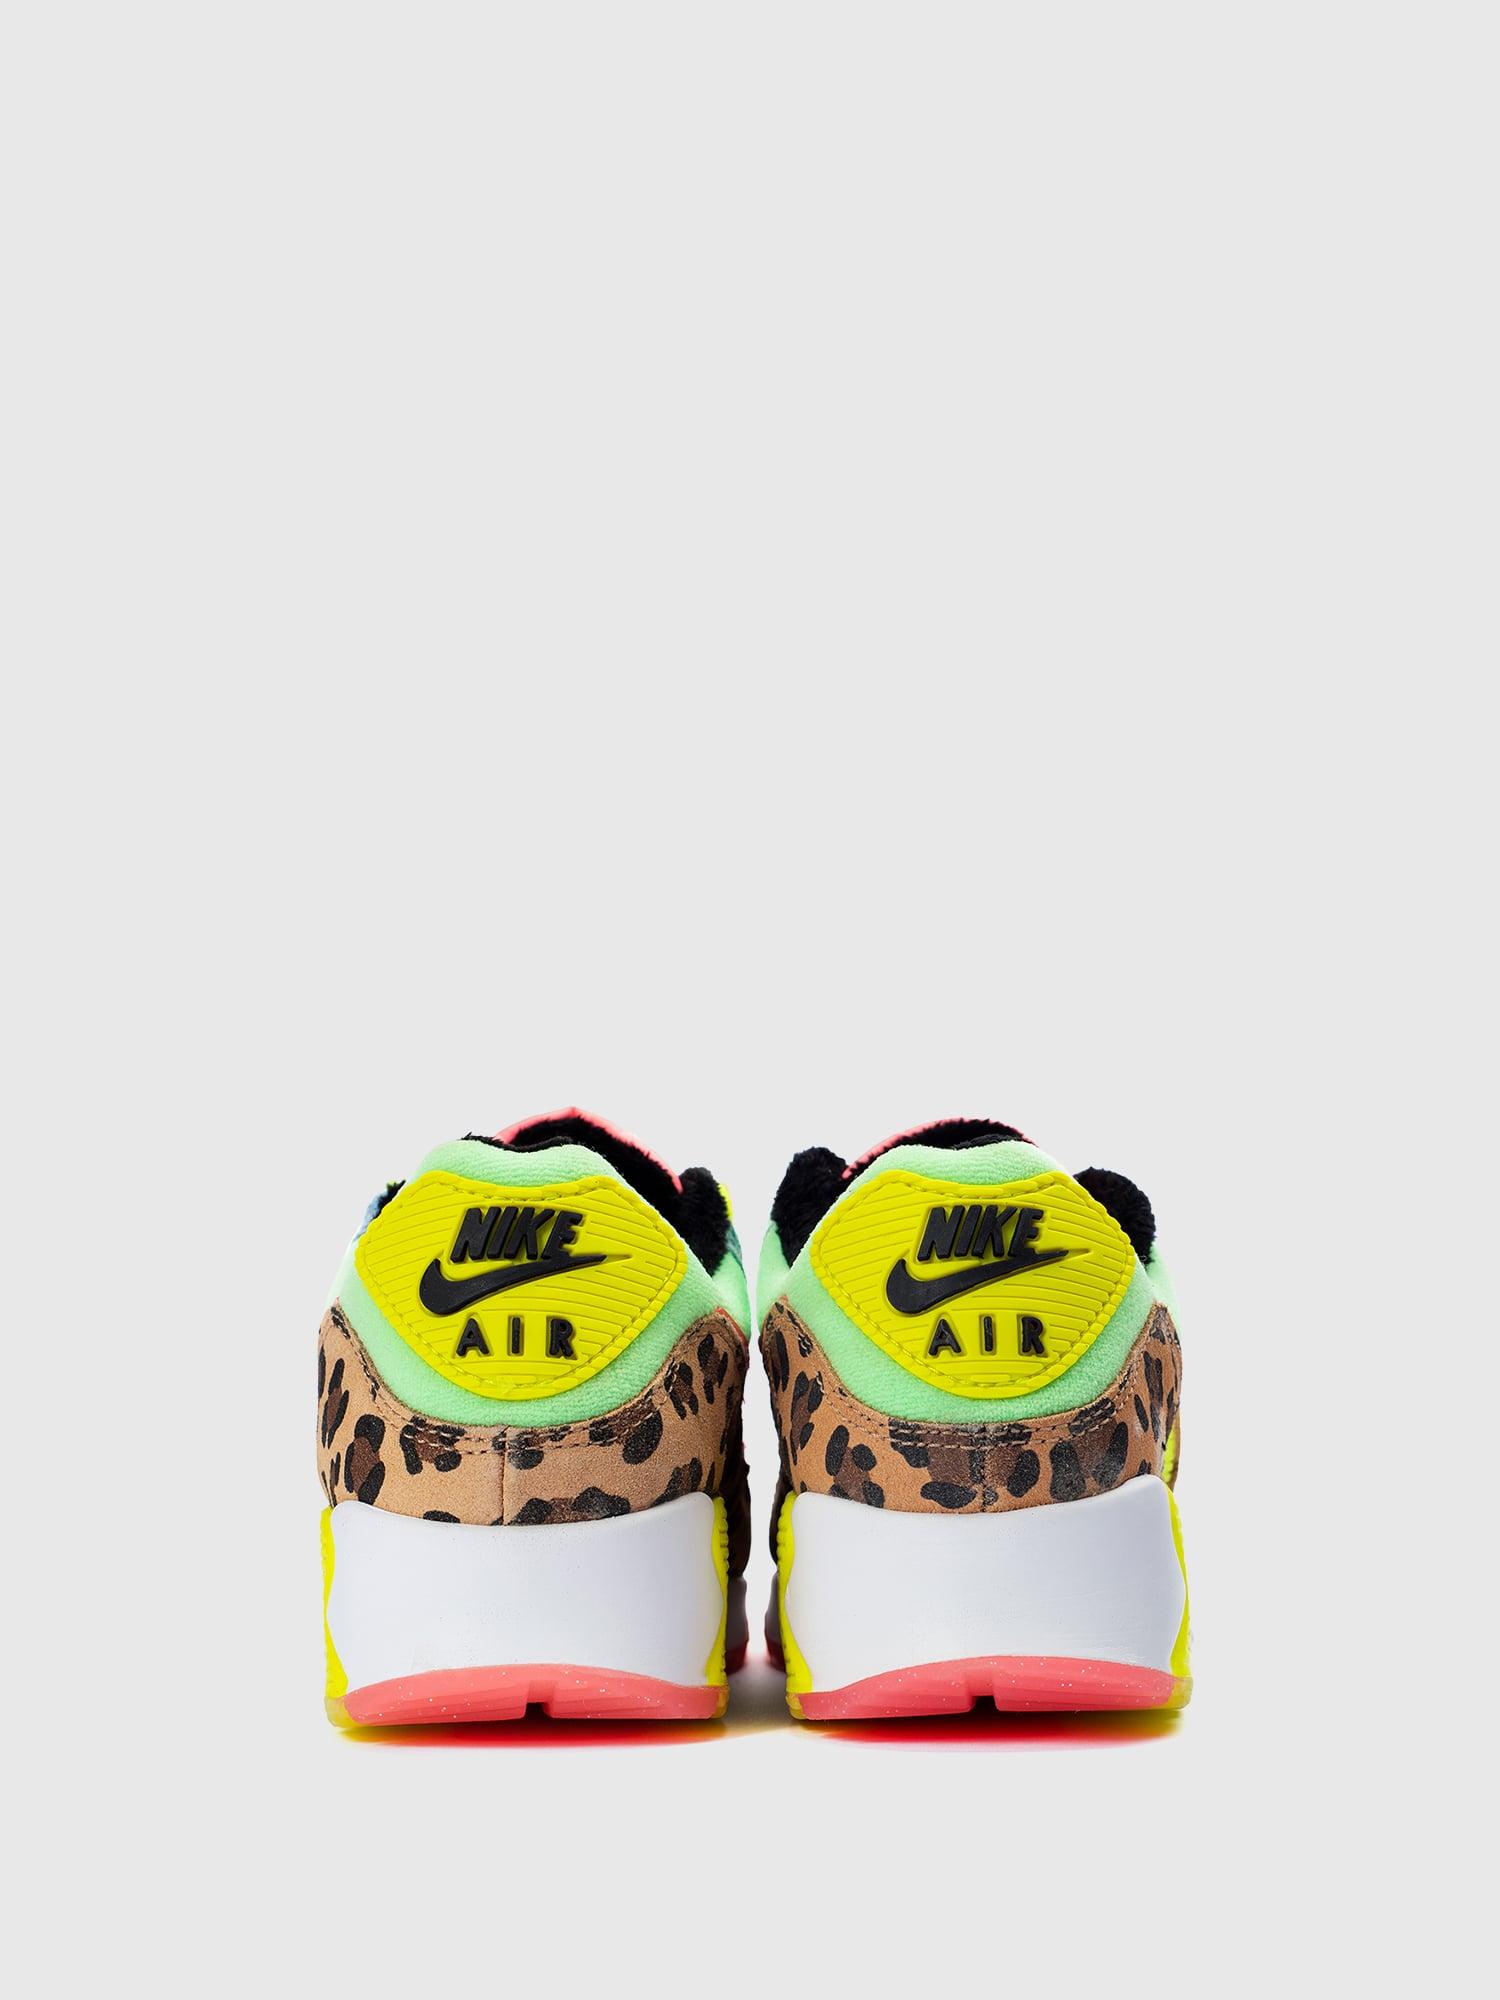 Nike Air Max 90 LX 90s Dancefloor Green (W)